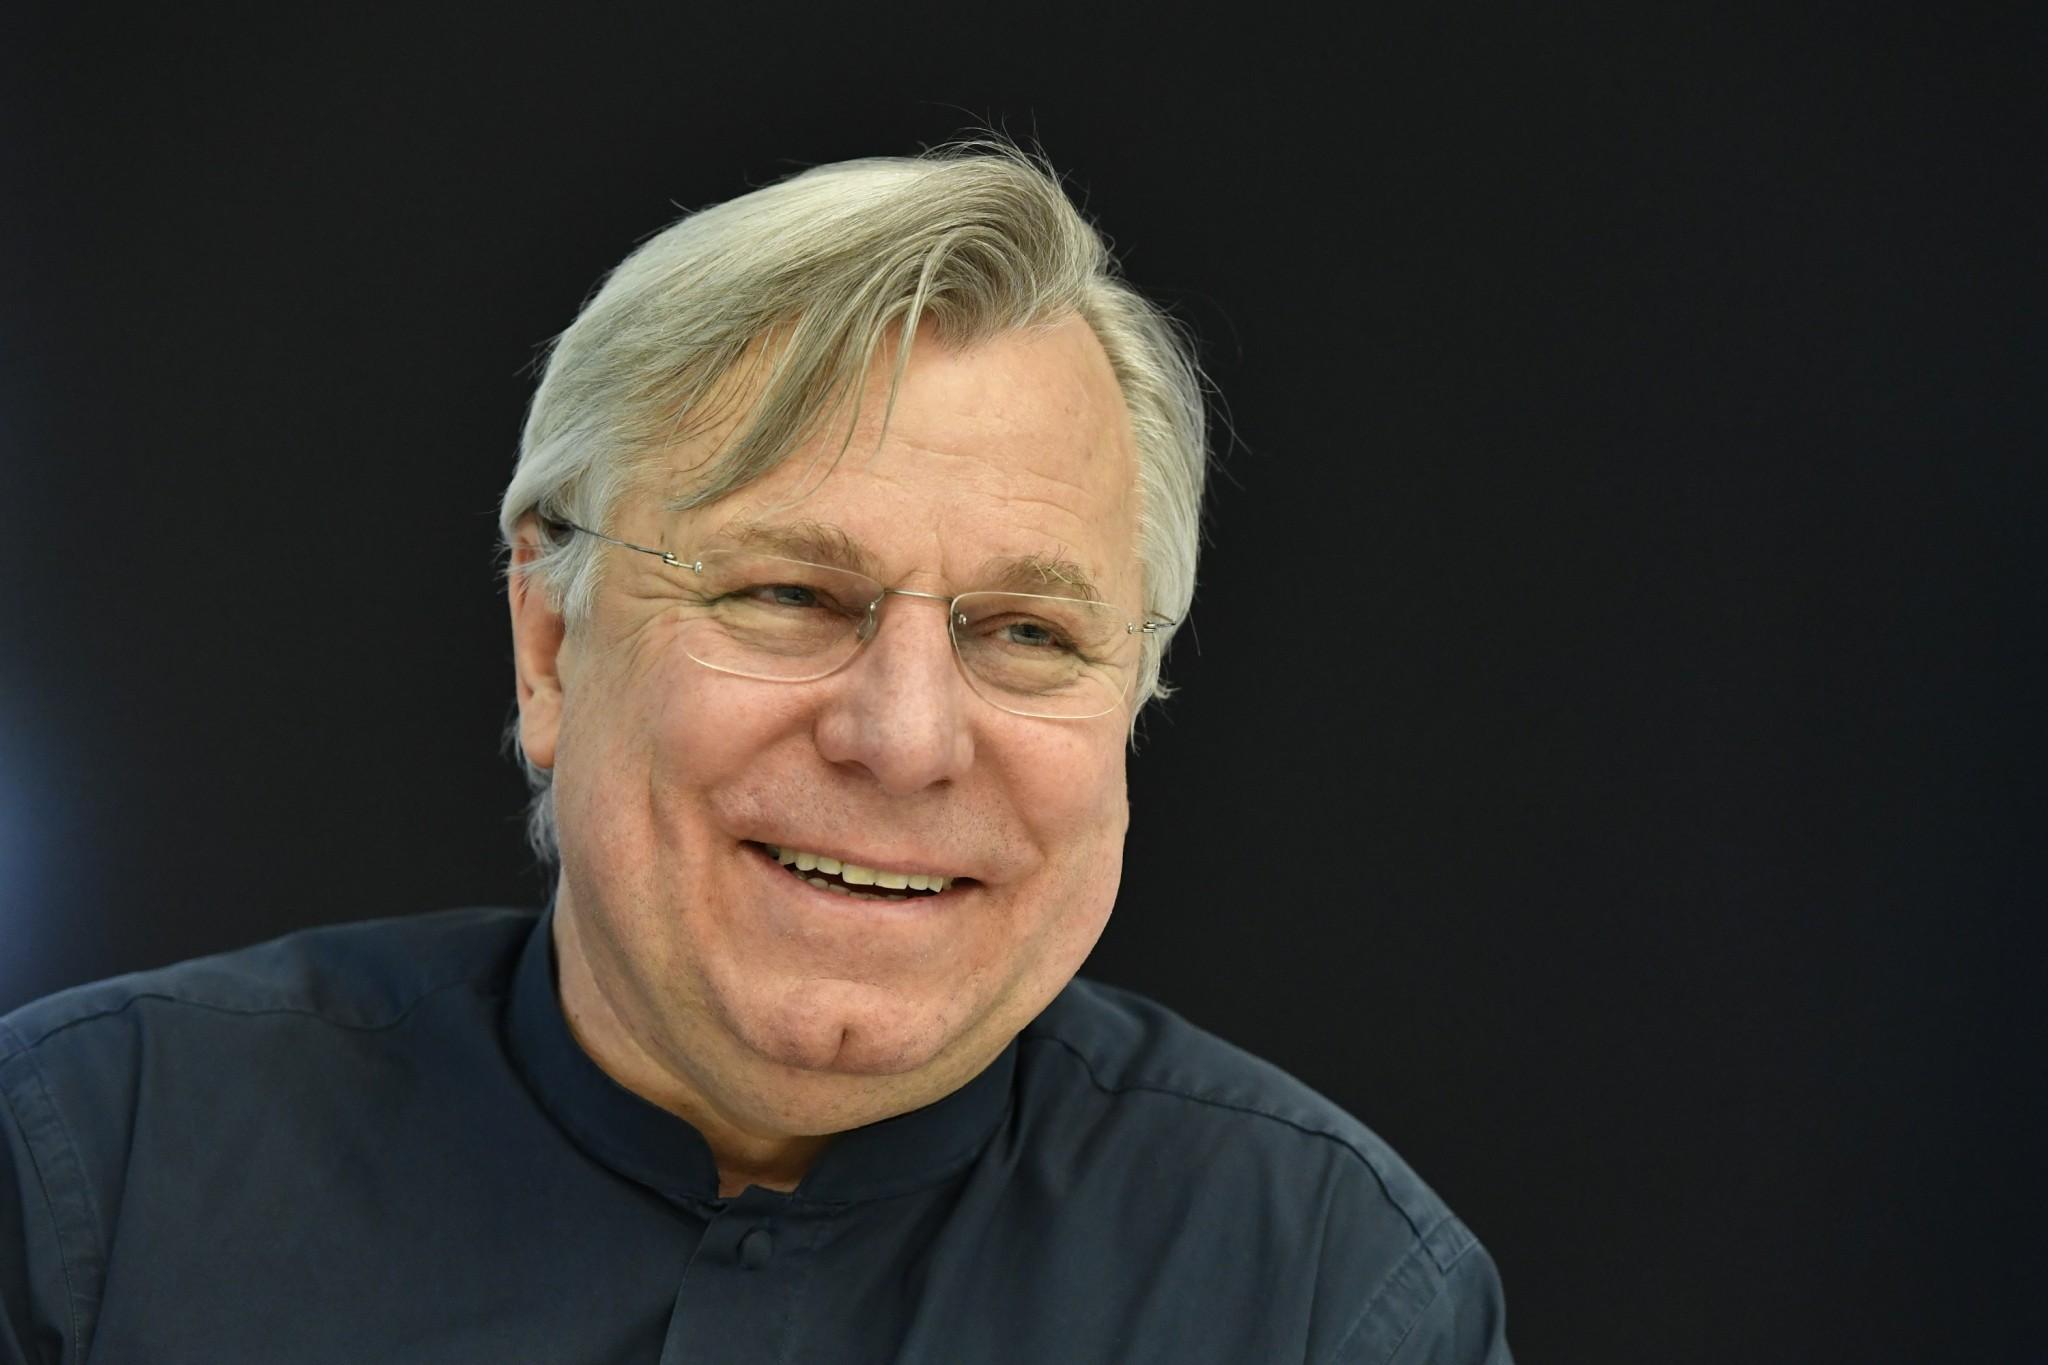 Professor Kelvin Willoughby. Photo: Skoltech.